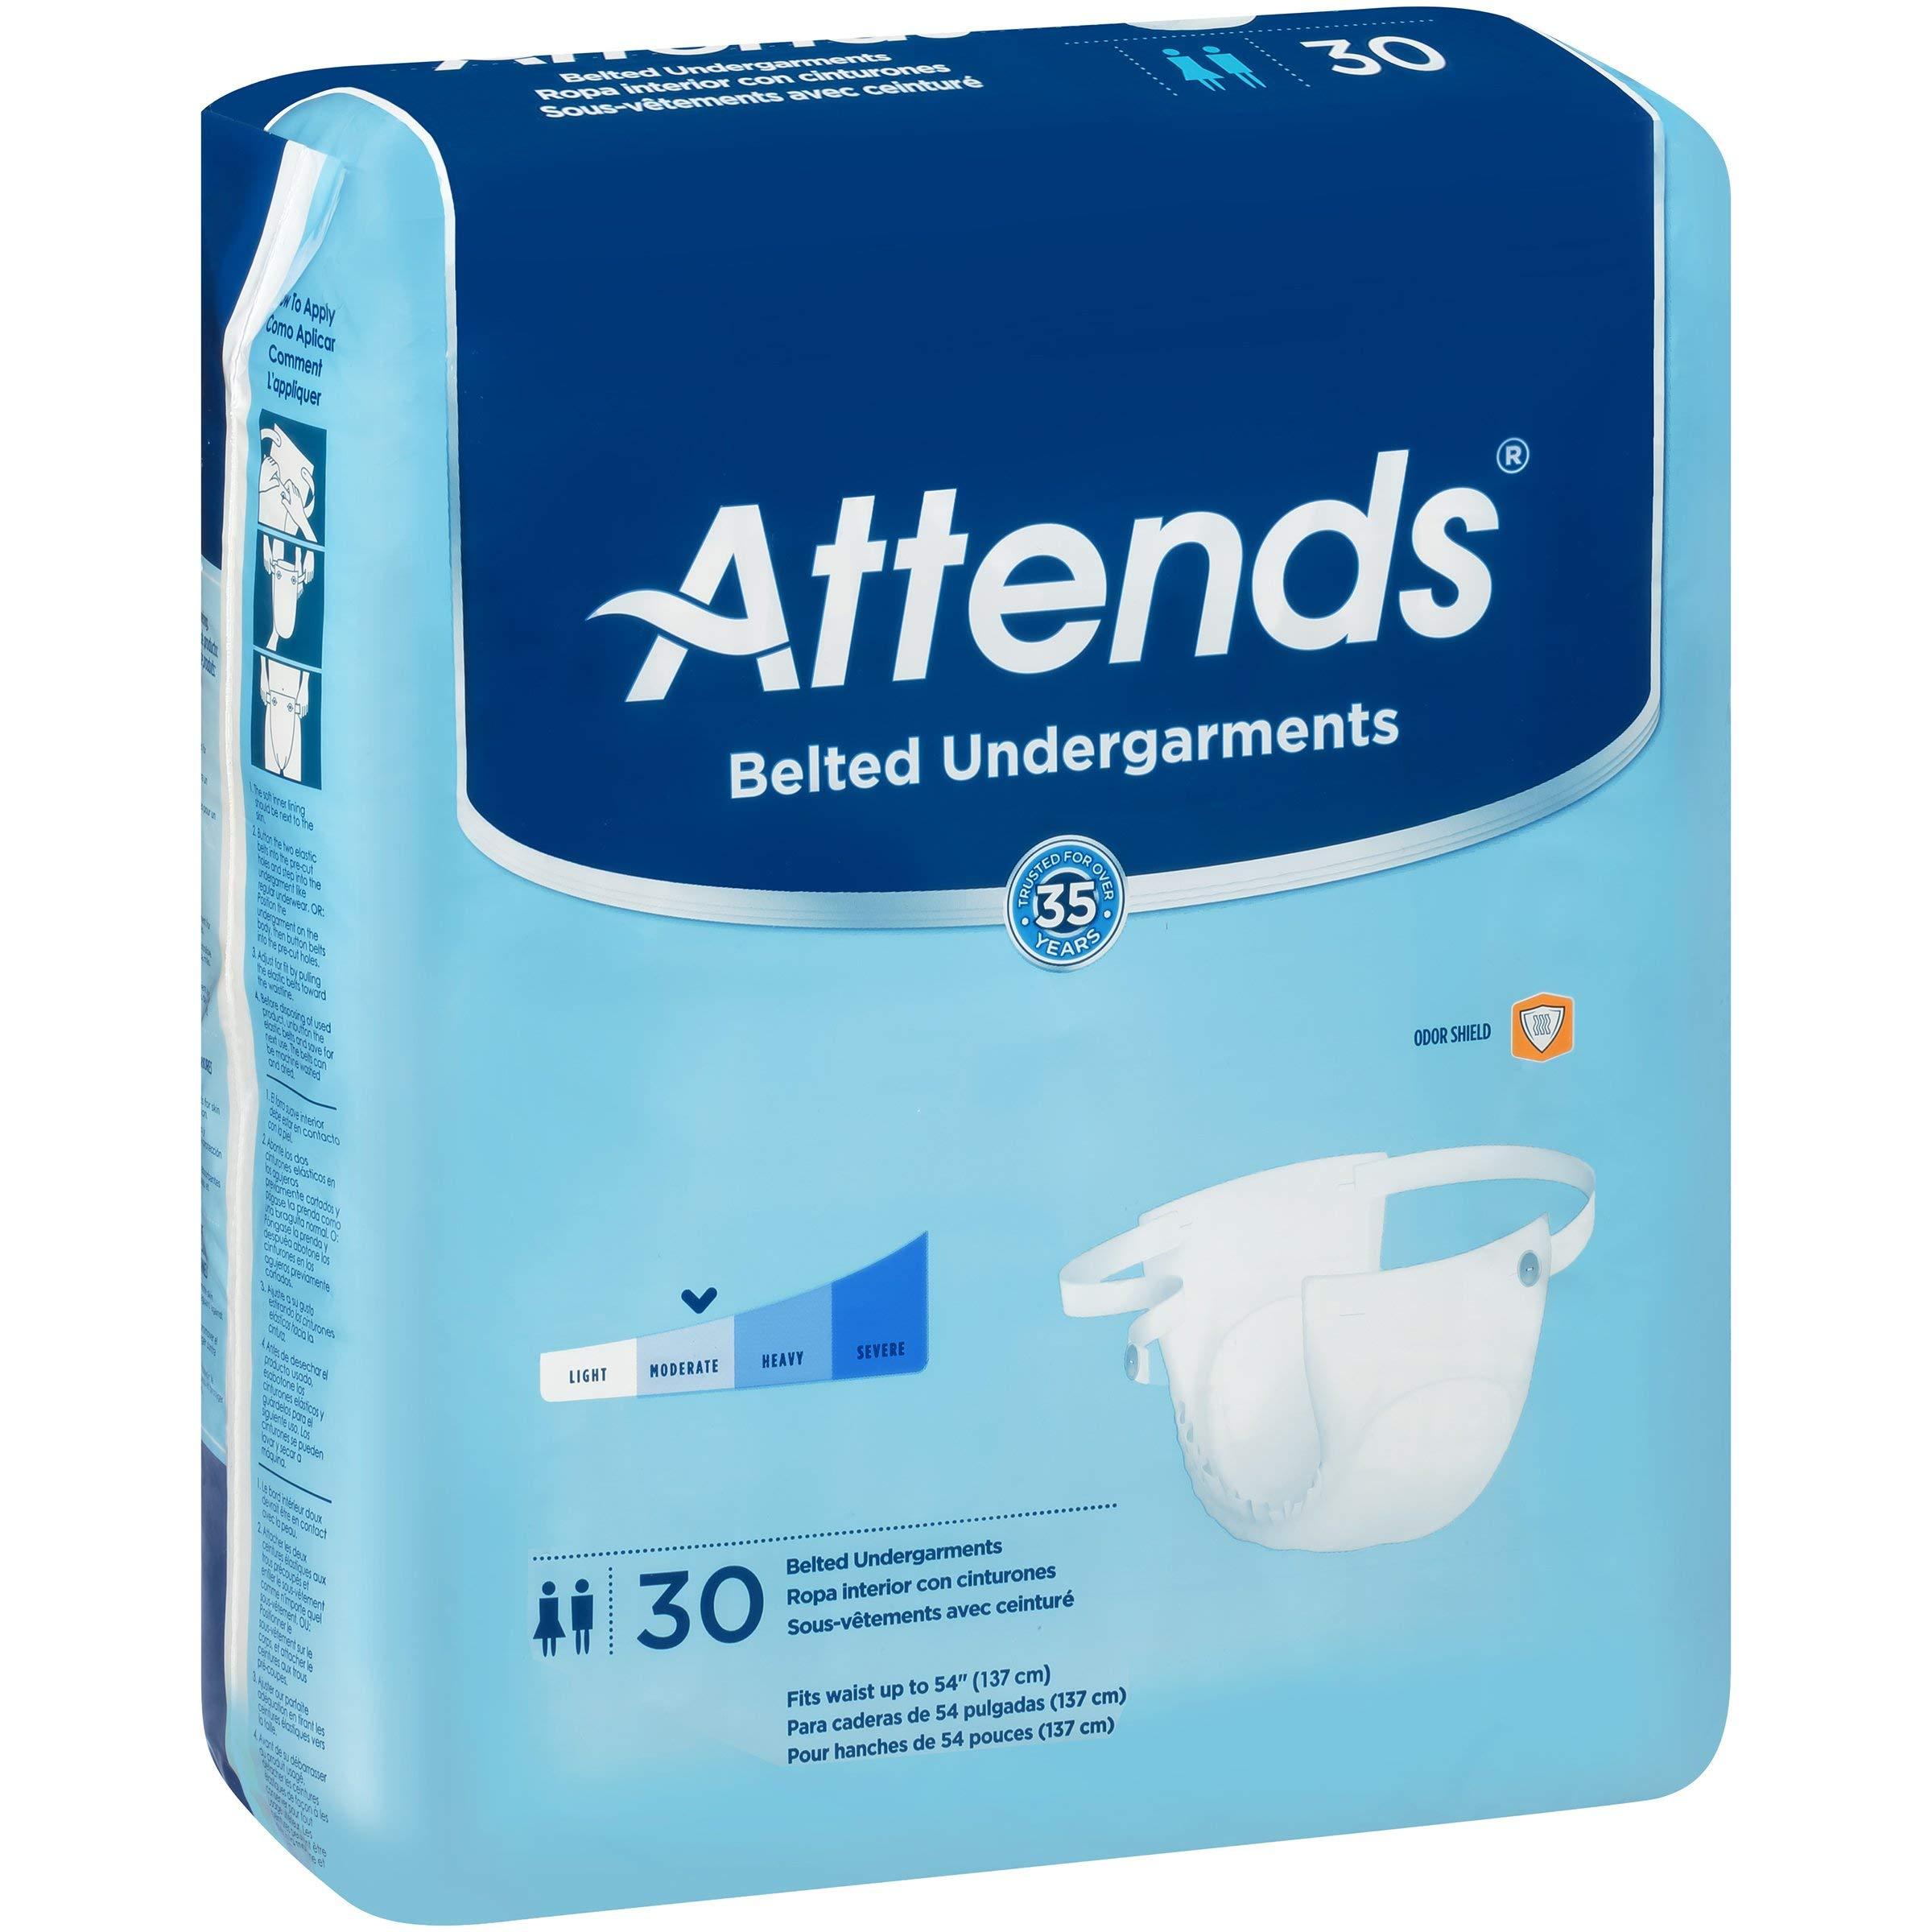 Special 4 packs of Attends Belted Undergarment Bulk - 30 per pack - Attends BU0600